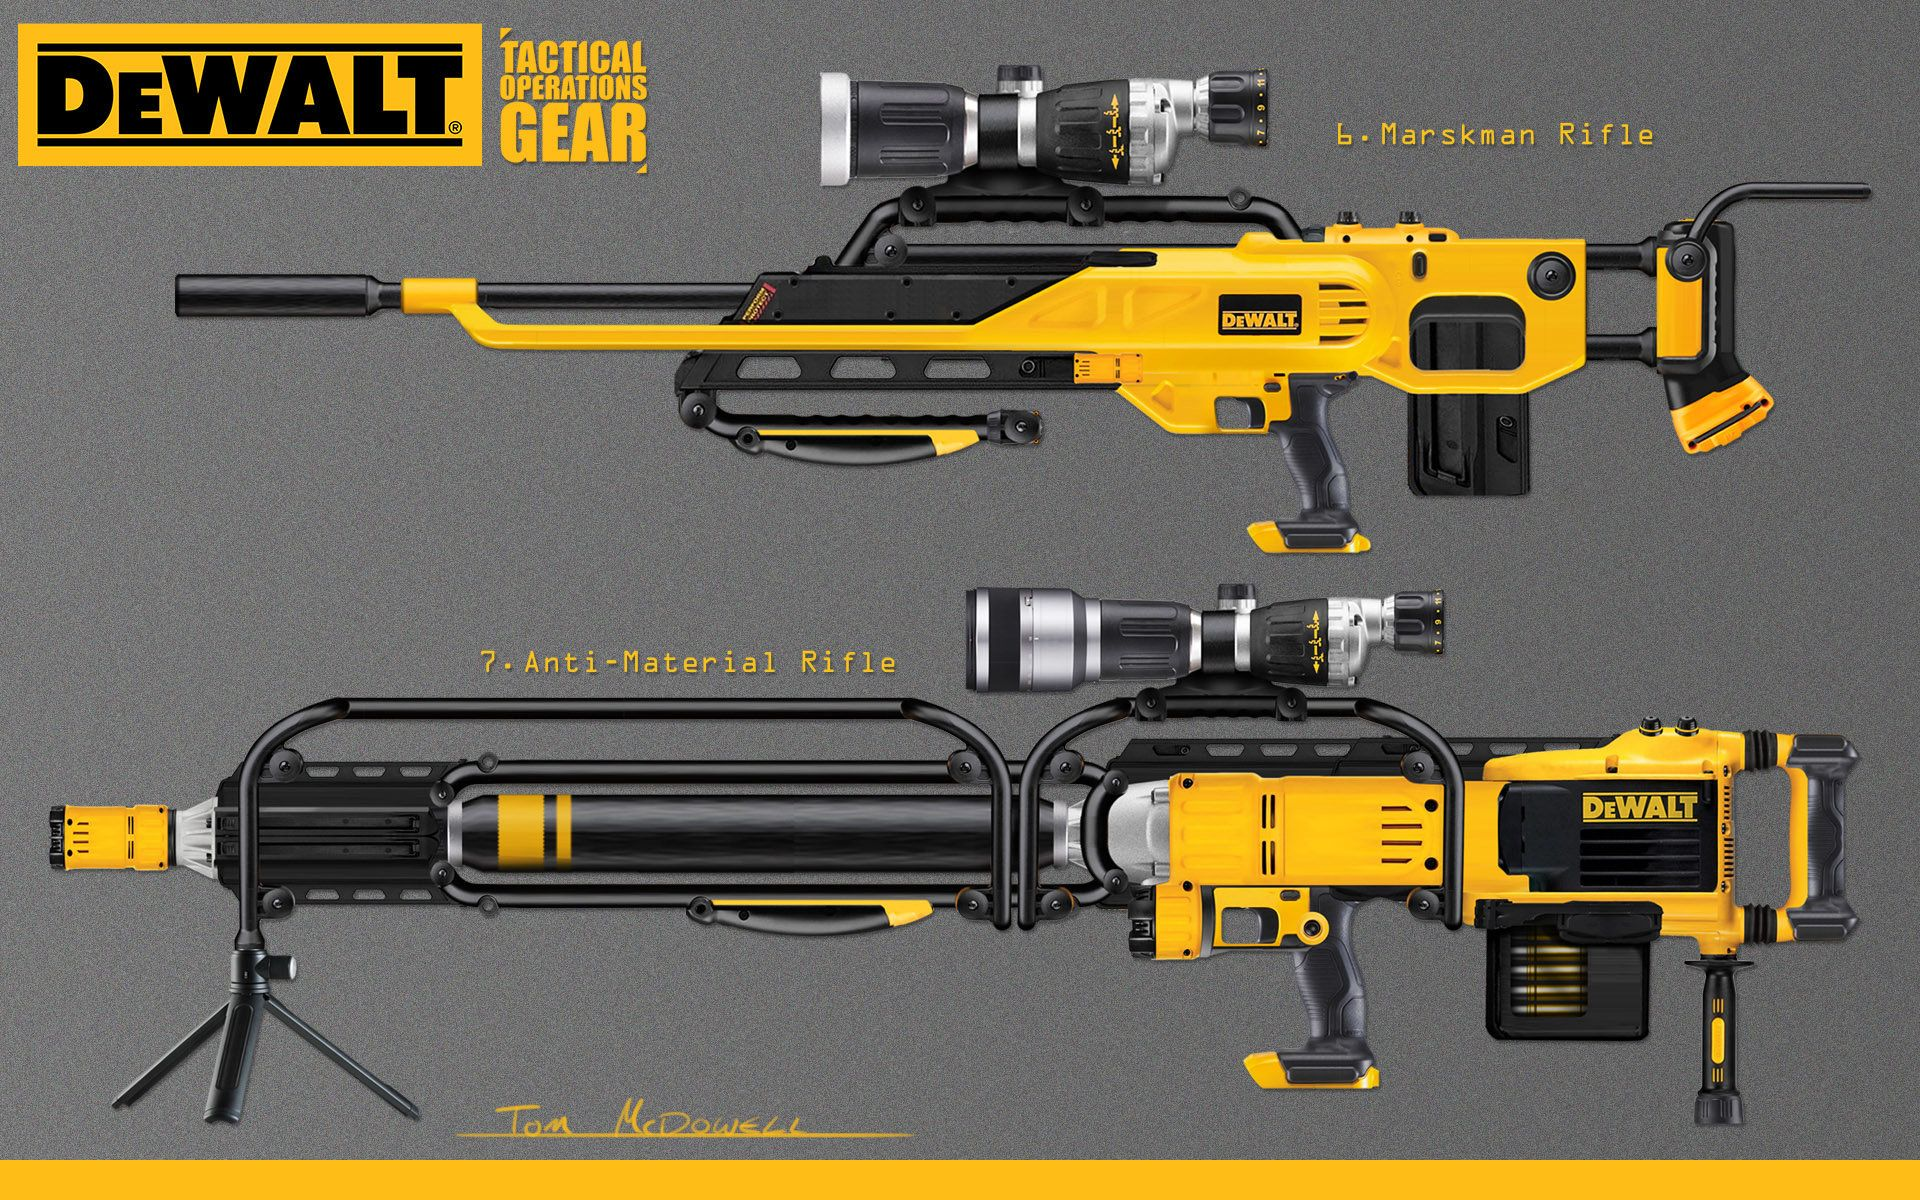 THIS DeWALT NAIL GUN WILL SHOOT A 16D NAIL 200 FEET. DOES NOT NEED A ...